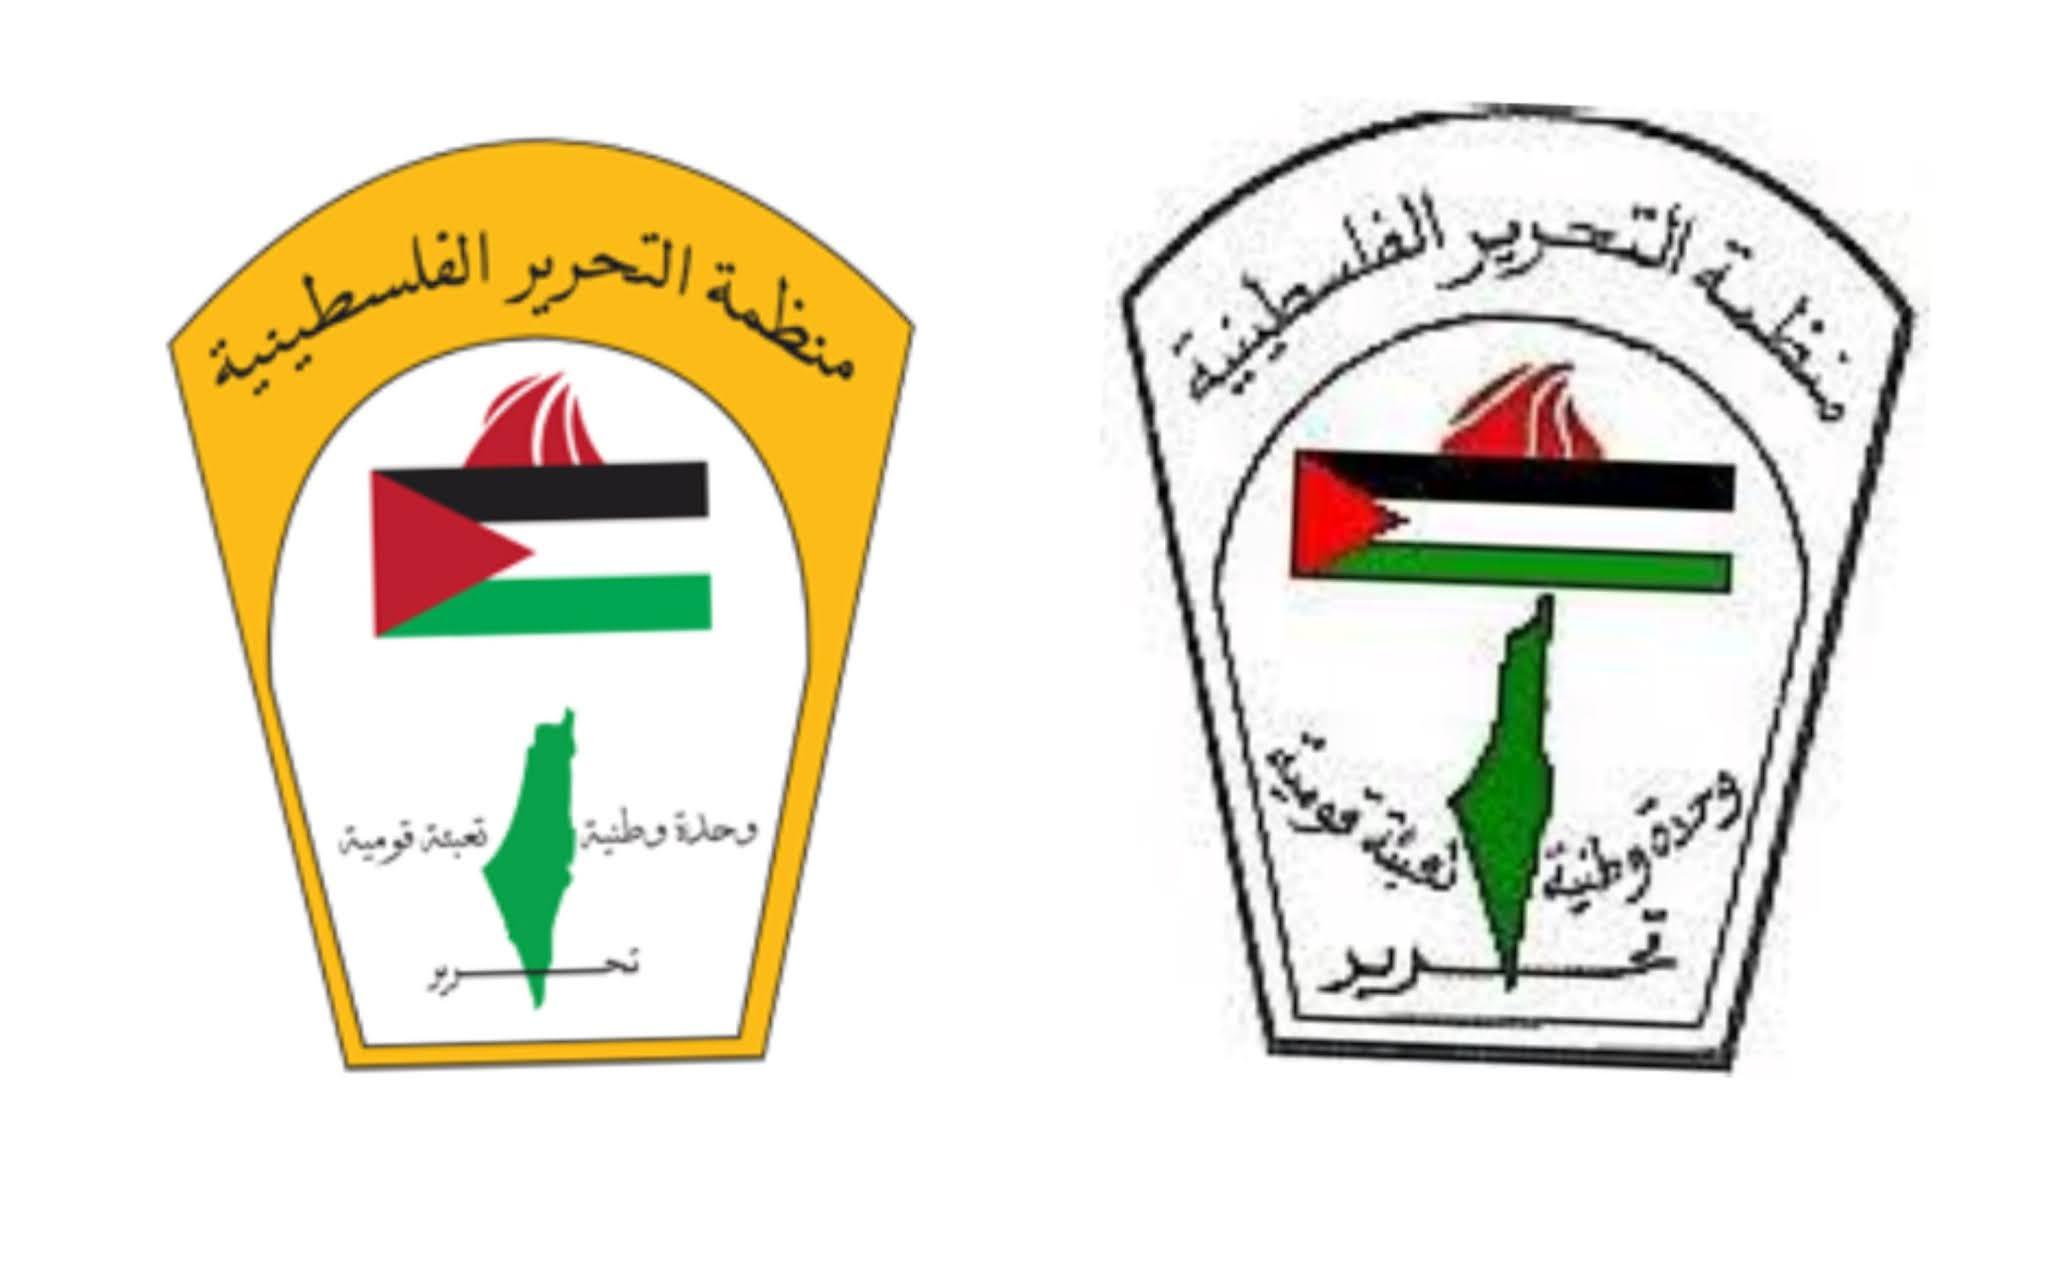 Palestine Liberation Organisation (PLO) Logo